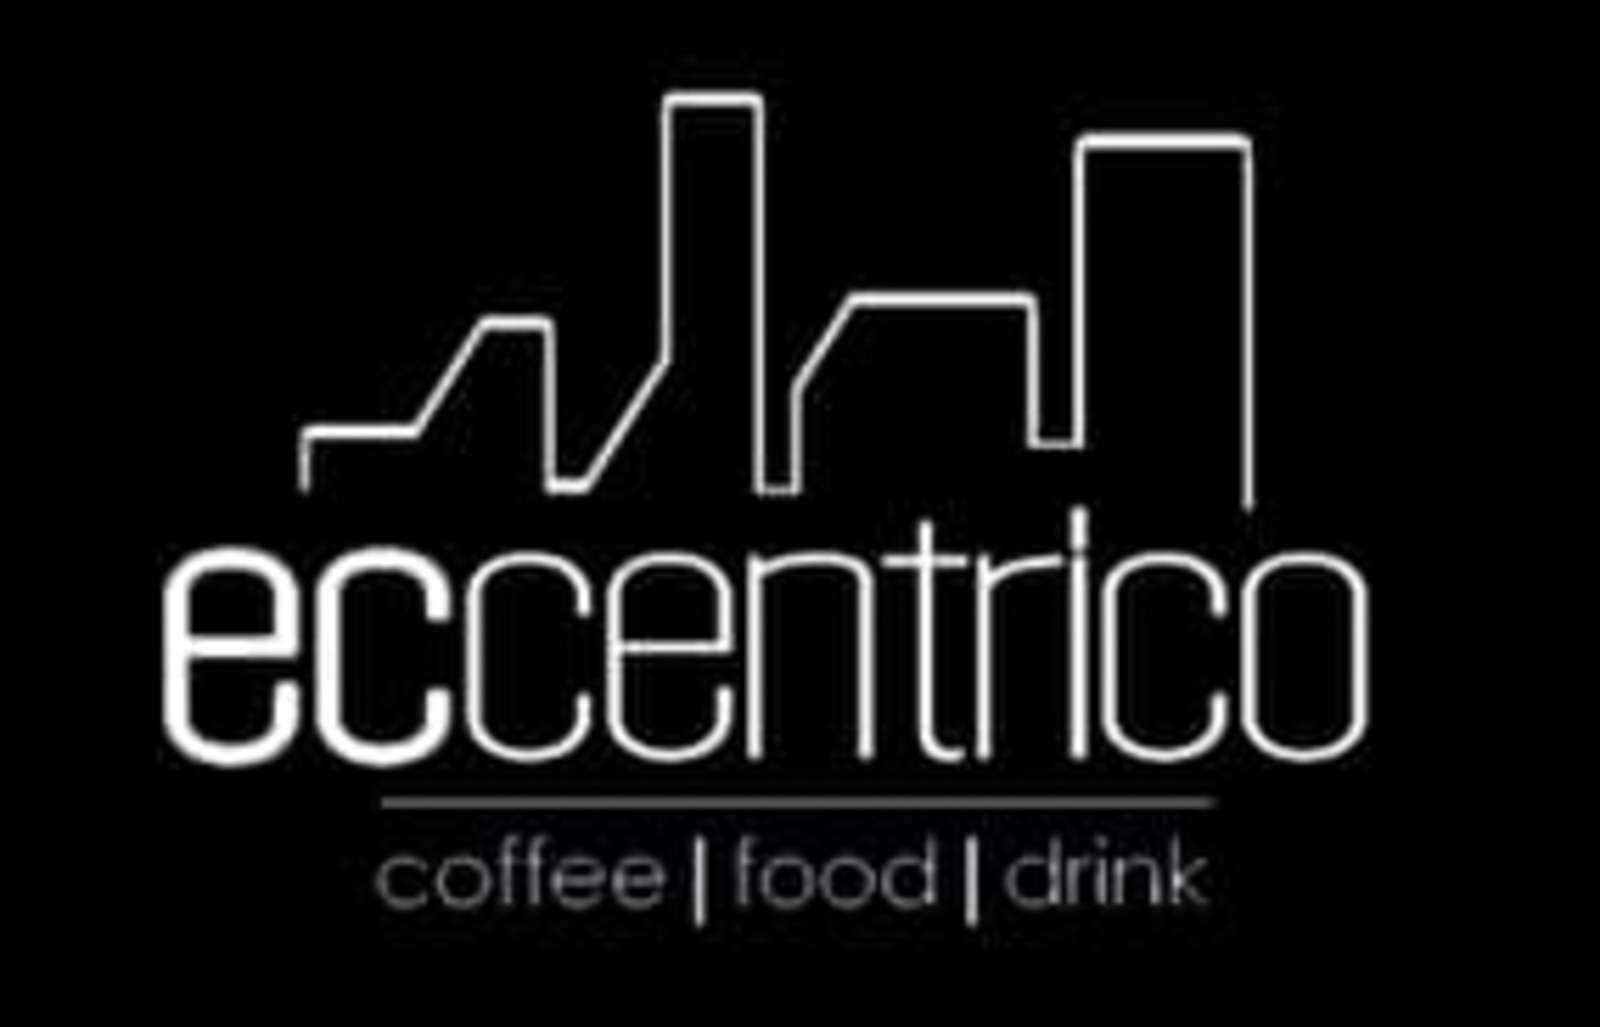 Eccentrico - Coffee | Food | Drink